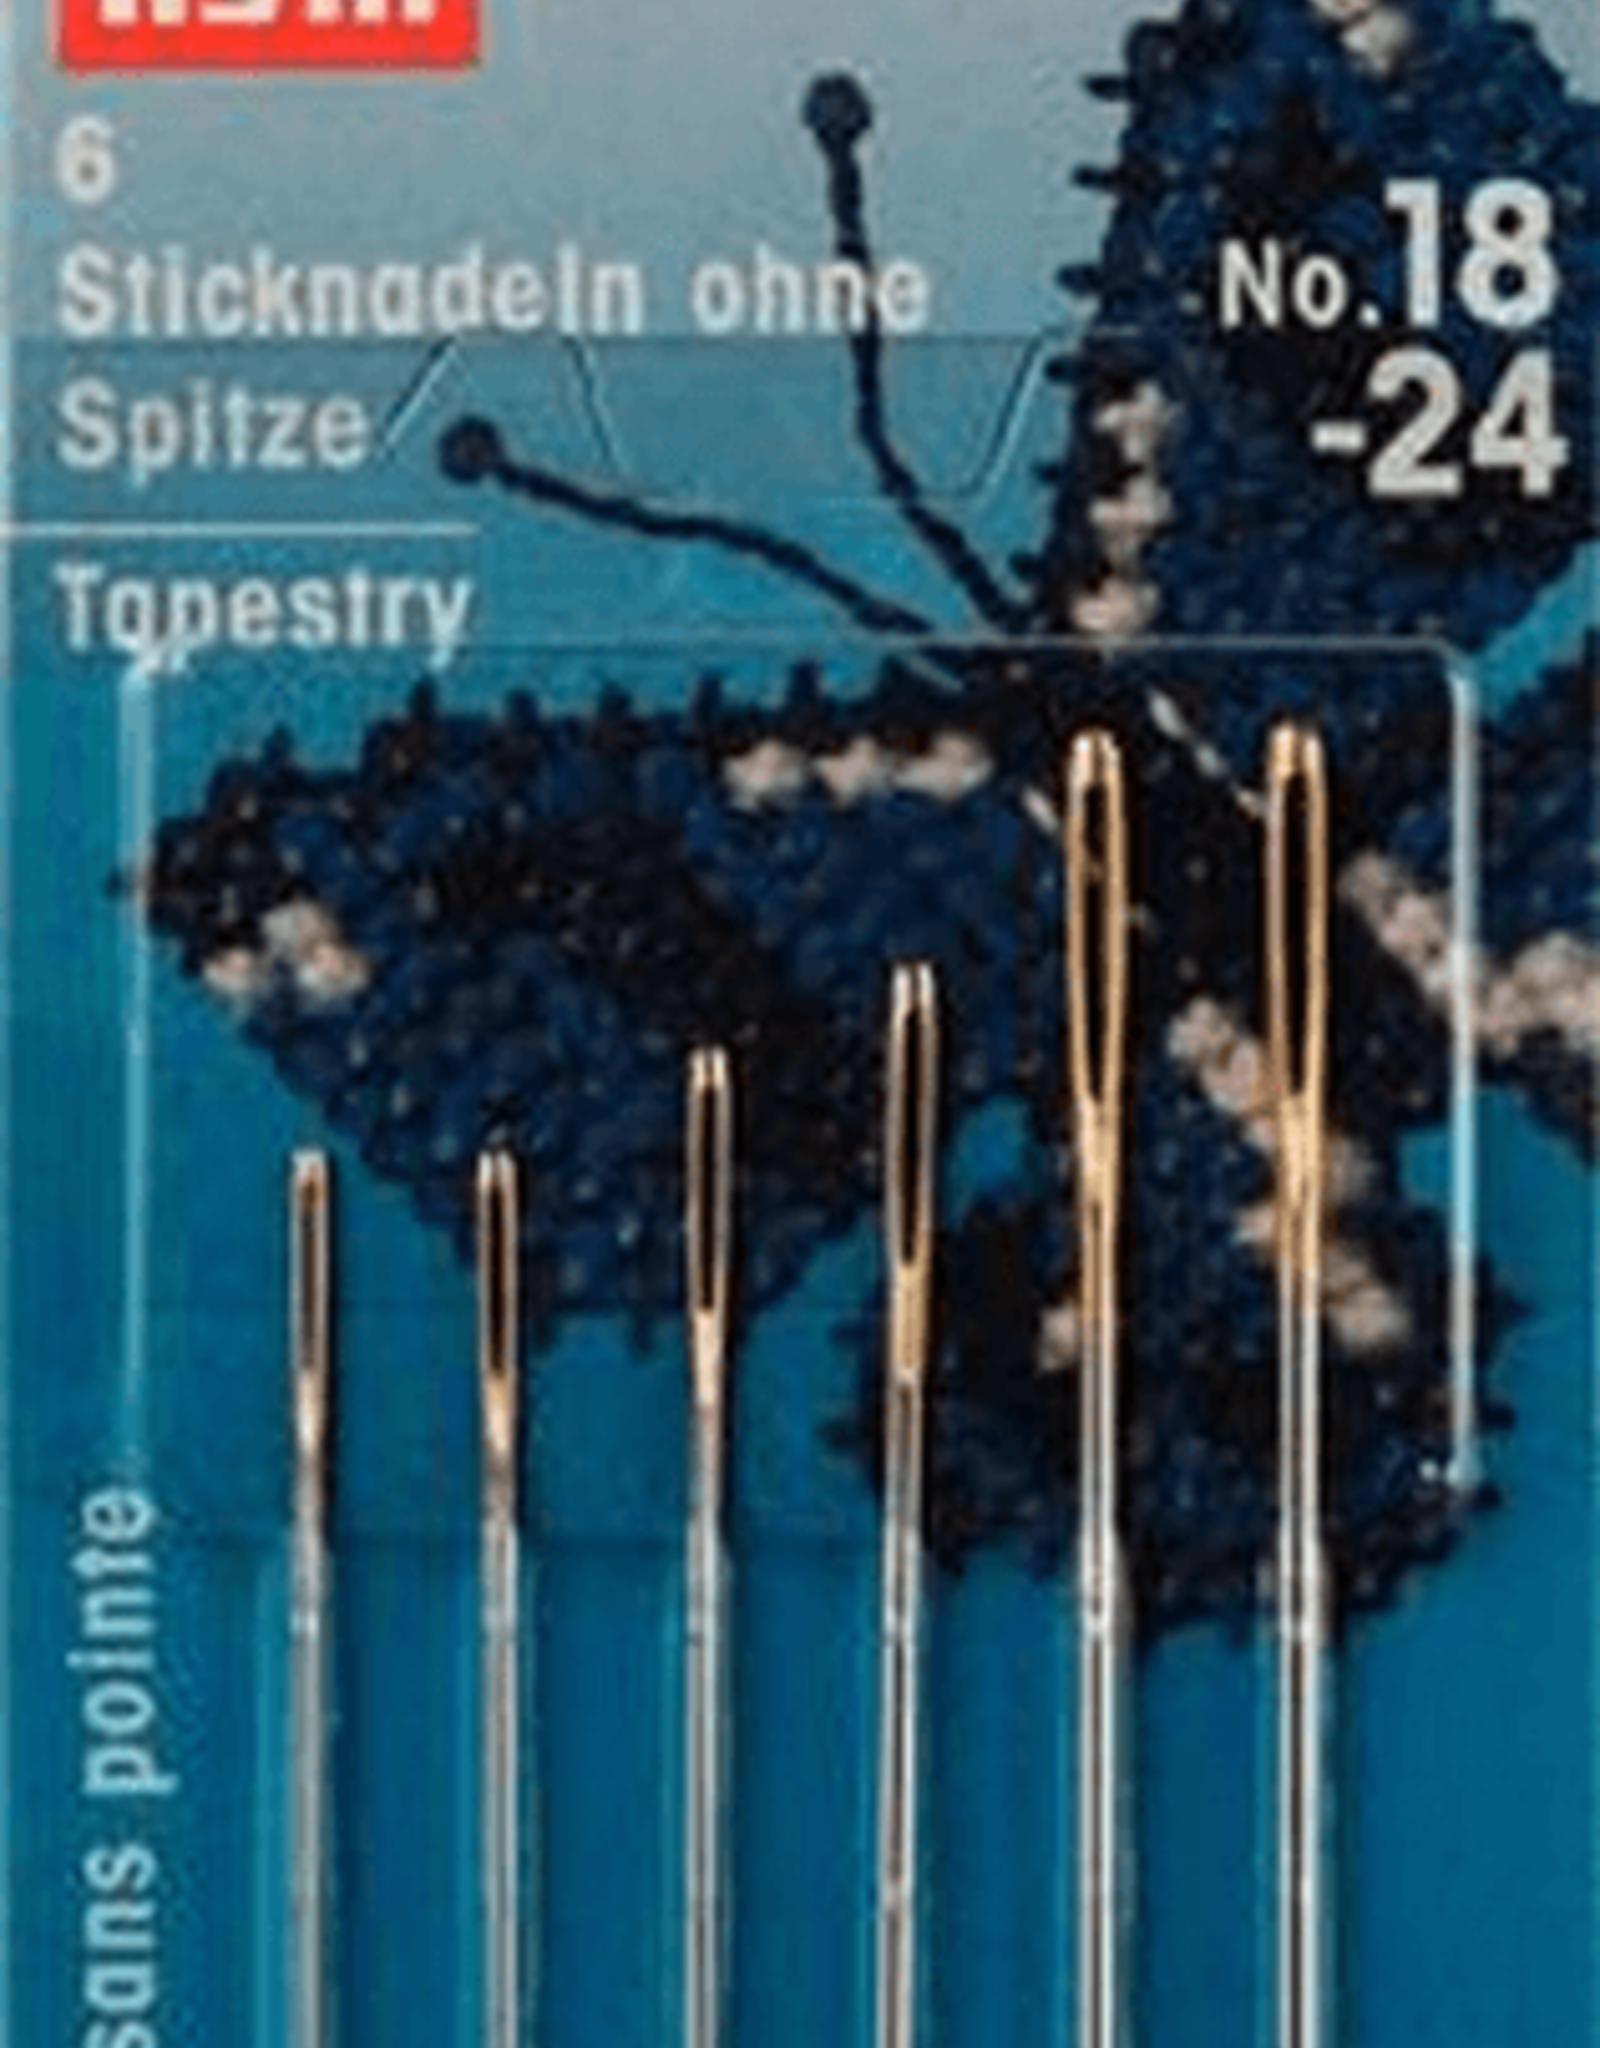 Prym Prym 125.560  - Borduurnaalden zonder punt assor. nr.18-24